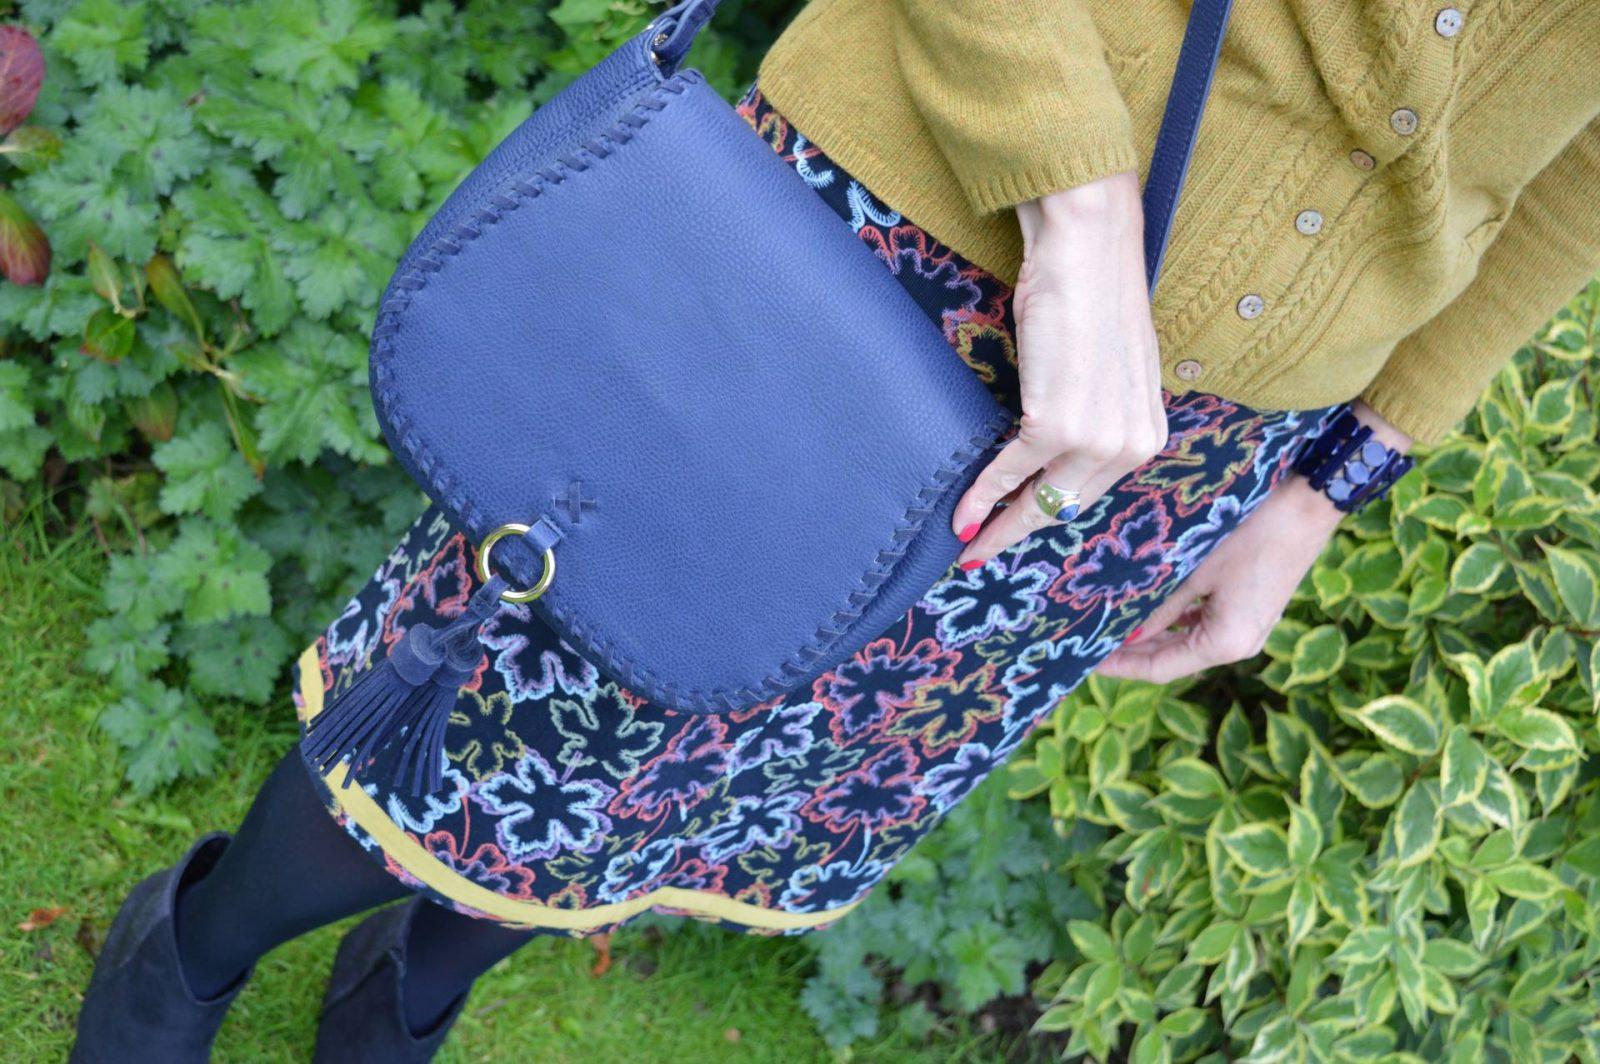 Mistral Cardigan and Leaf Print Skirt Laura Ashley whipstitch saddle bag